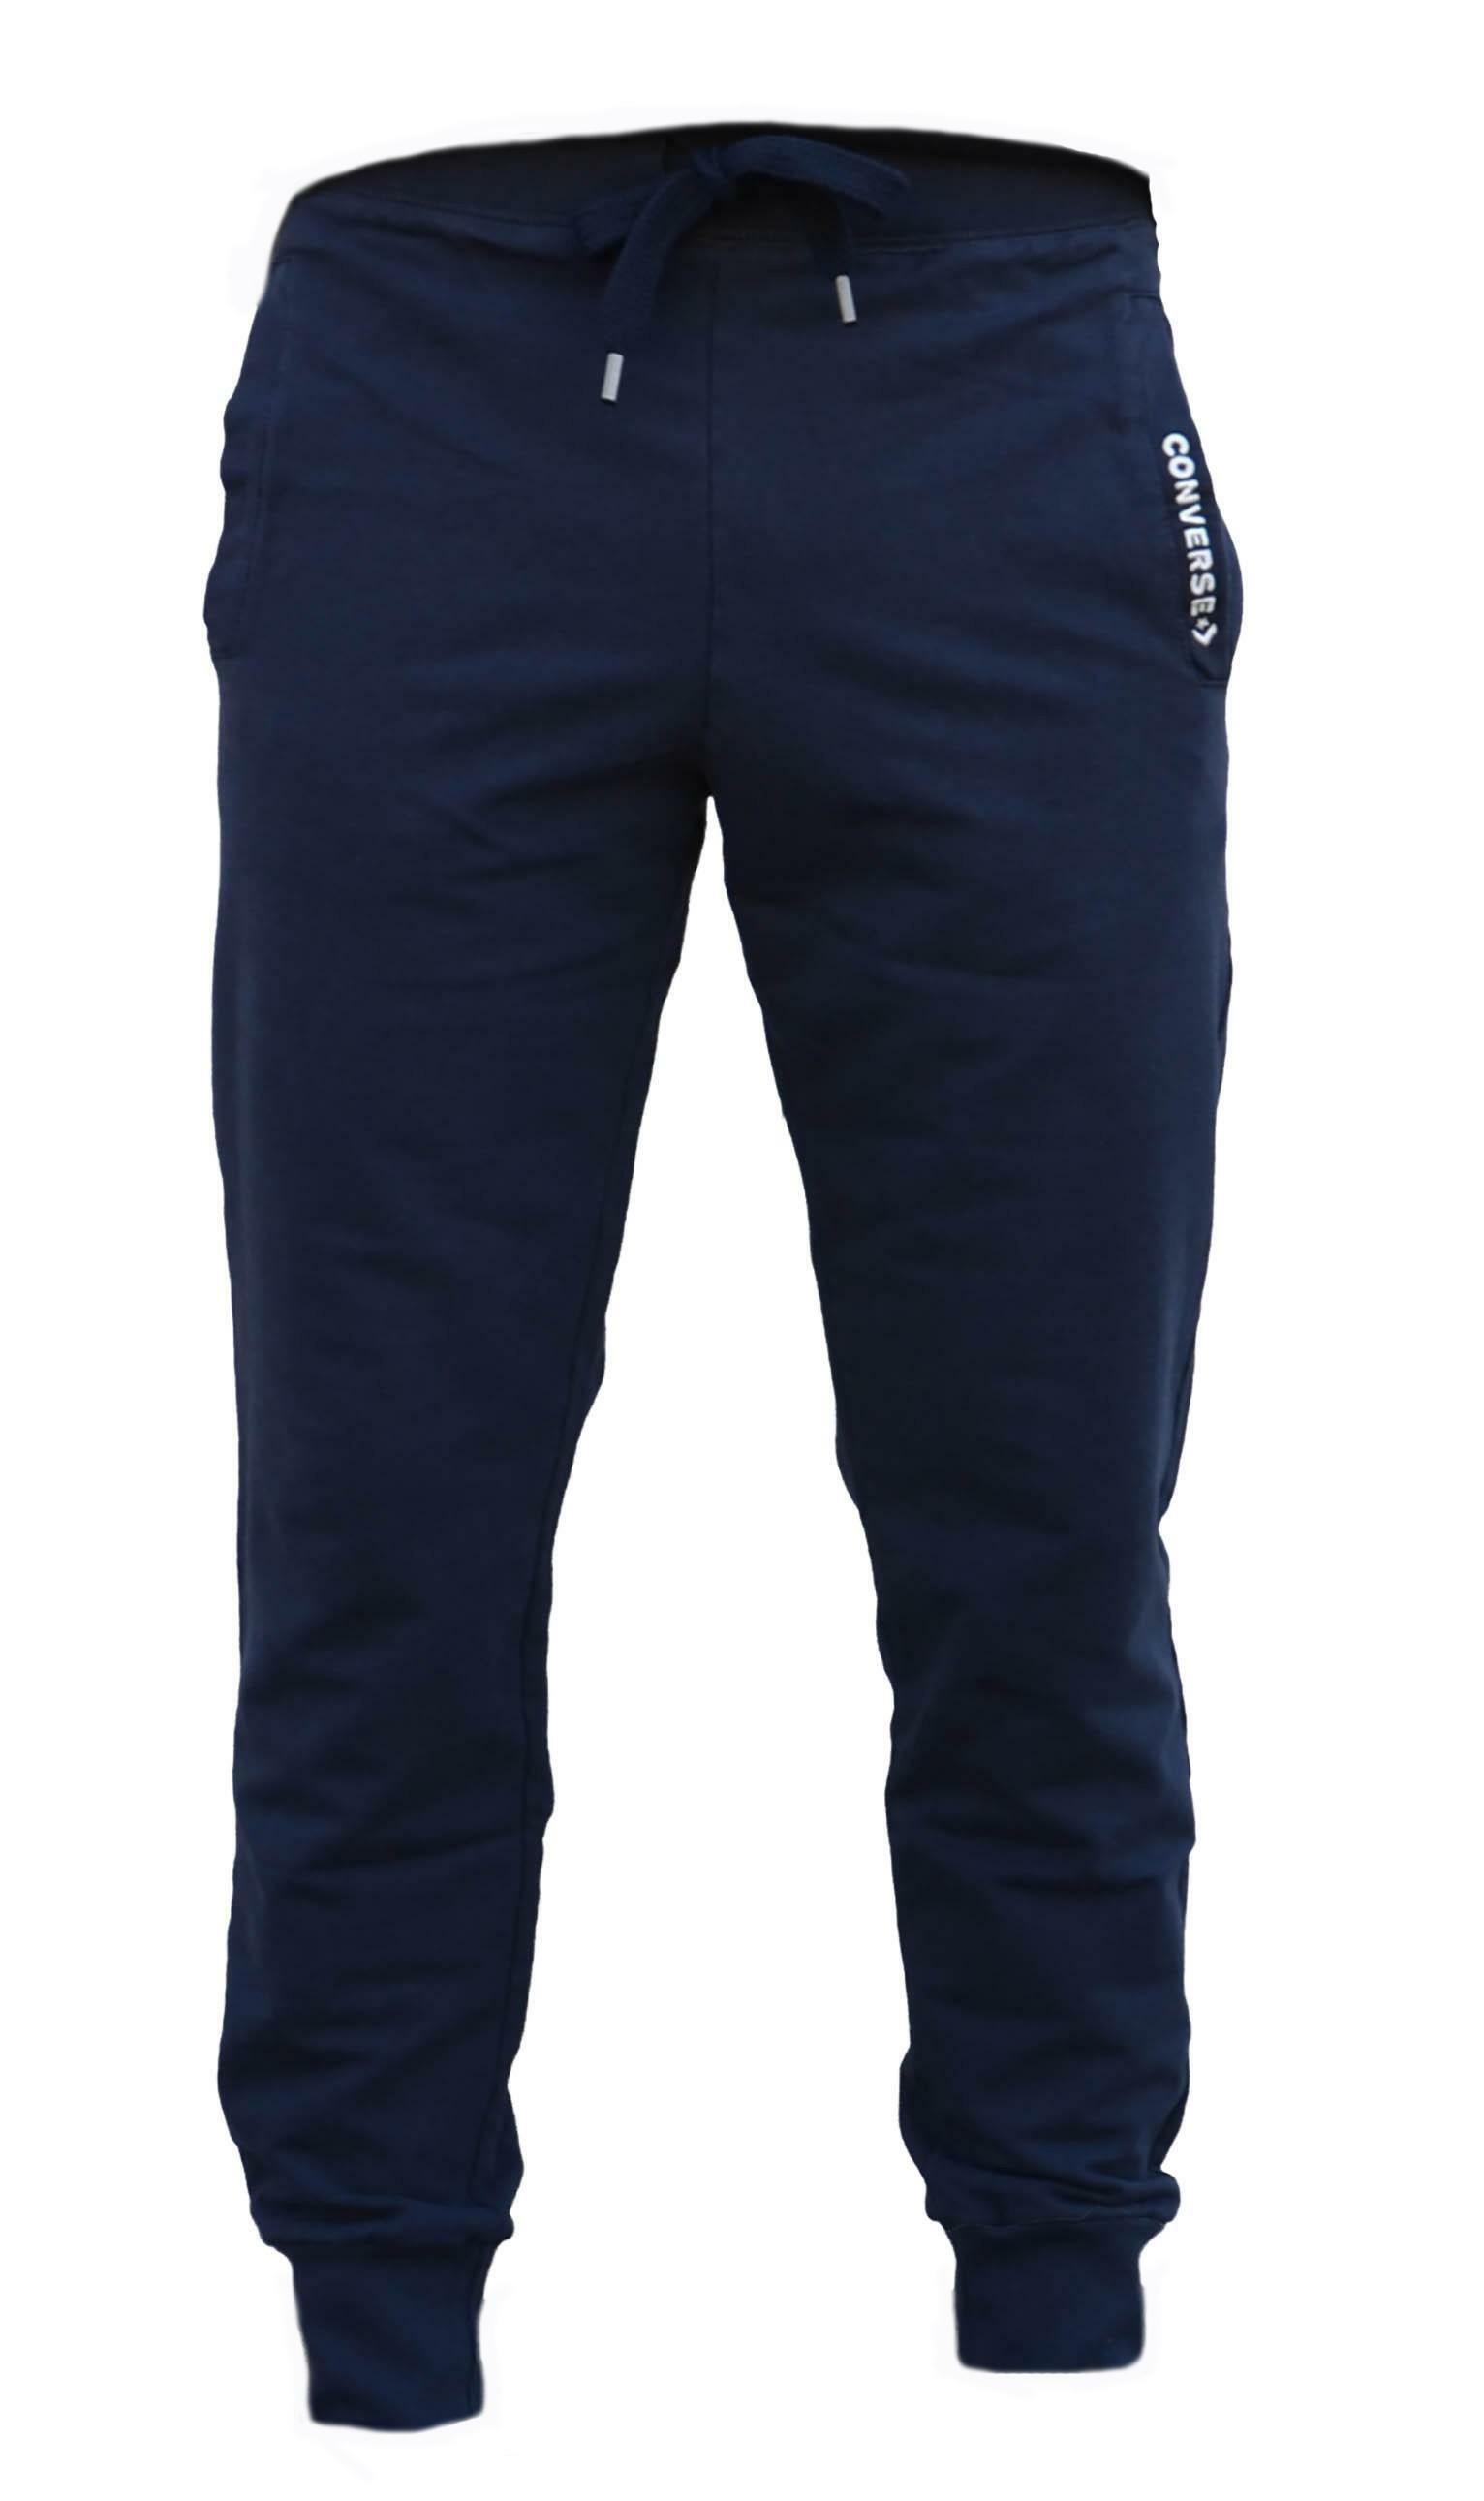 pantalone felpato converse off 74% -